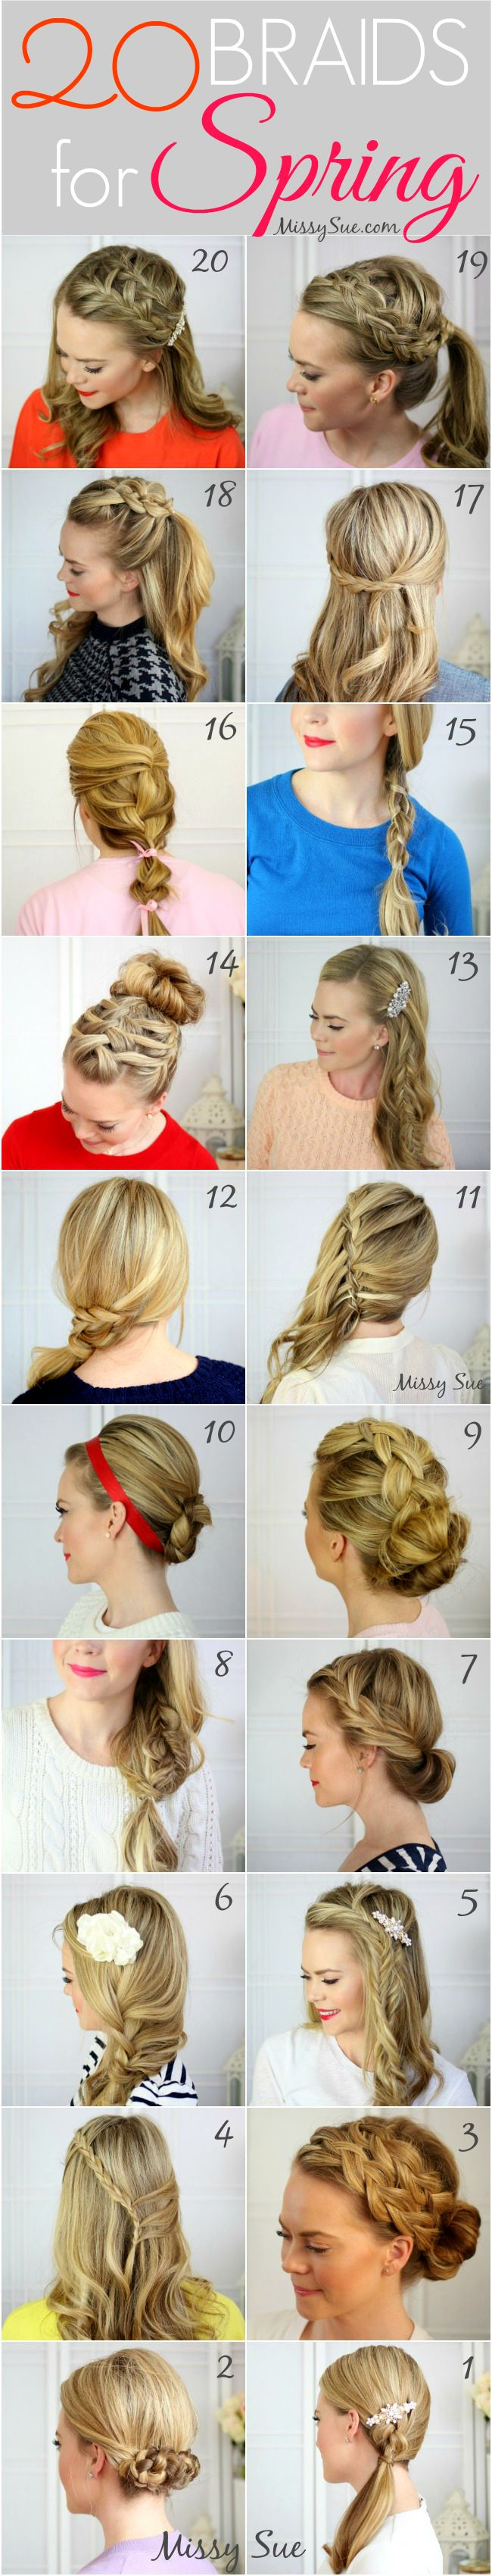 20 Braids for Spring @Elizabeth Lockhart Lockhart Lockhart Fetherolf this girl has great braiding tutorials